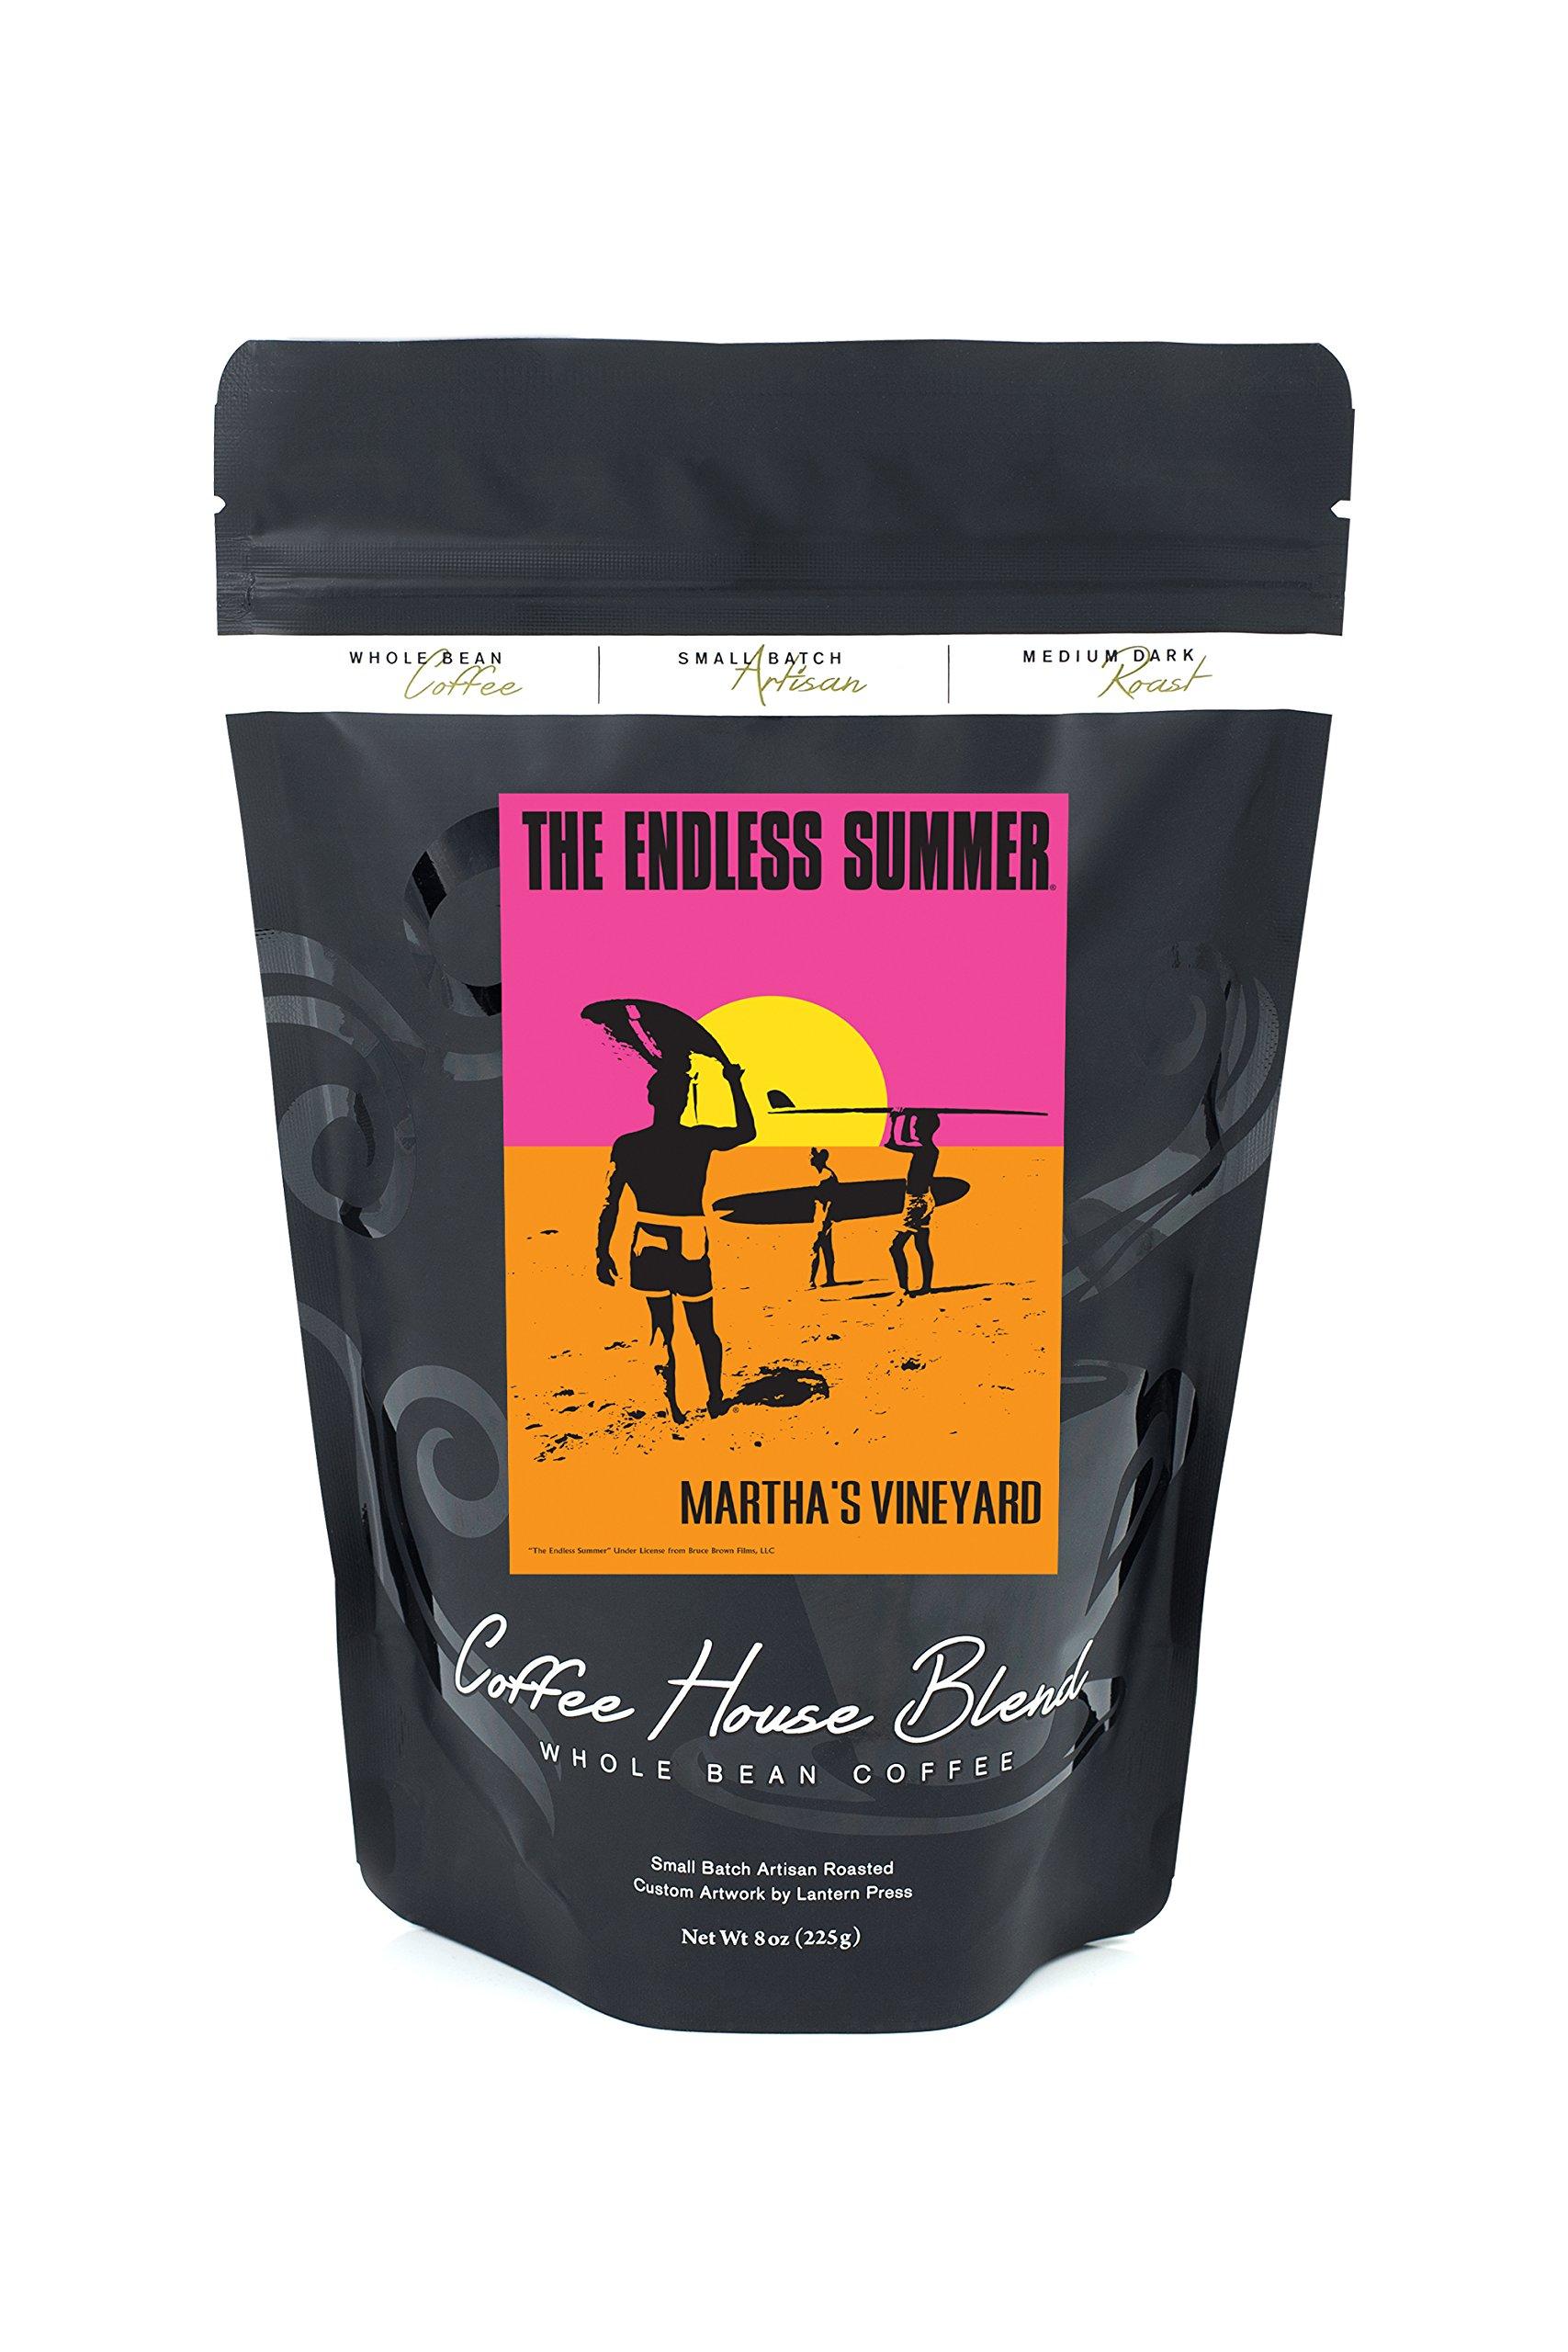 Martha's Vineyard - The Endless Summer - Original Movie Poster (8oz Whole Bean Small Batch Artisan Coffee - Bold & Strong Medium Dark Roast w/ Artwork)